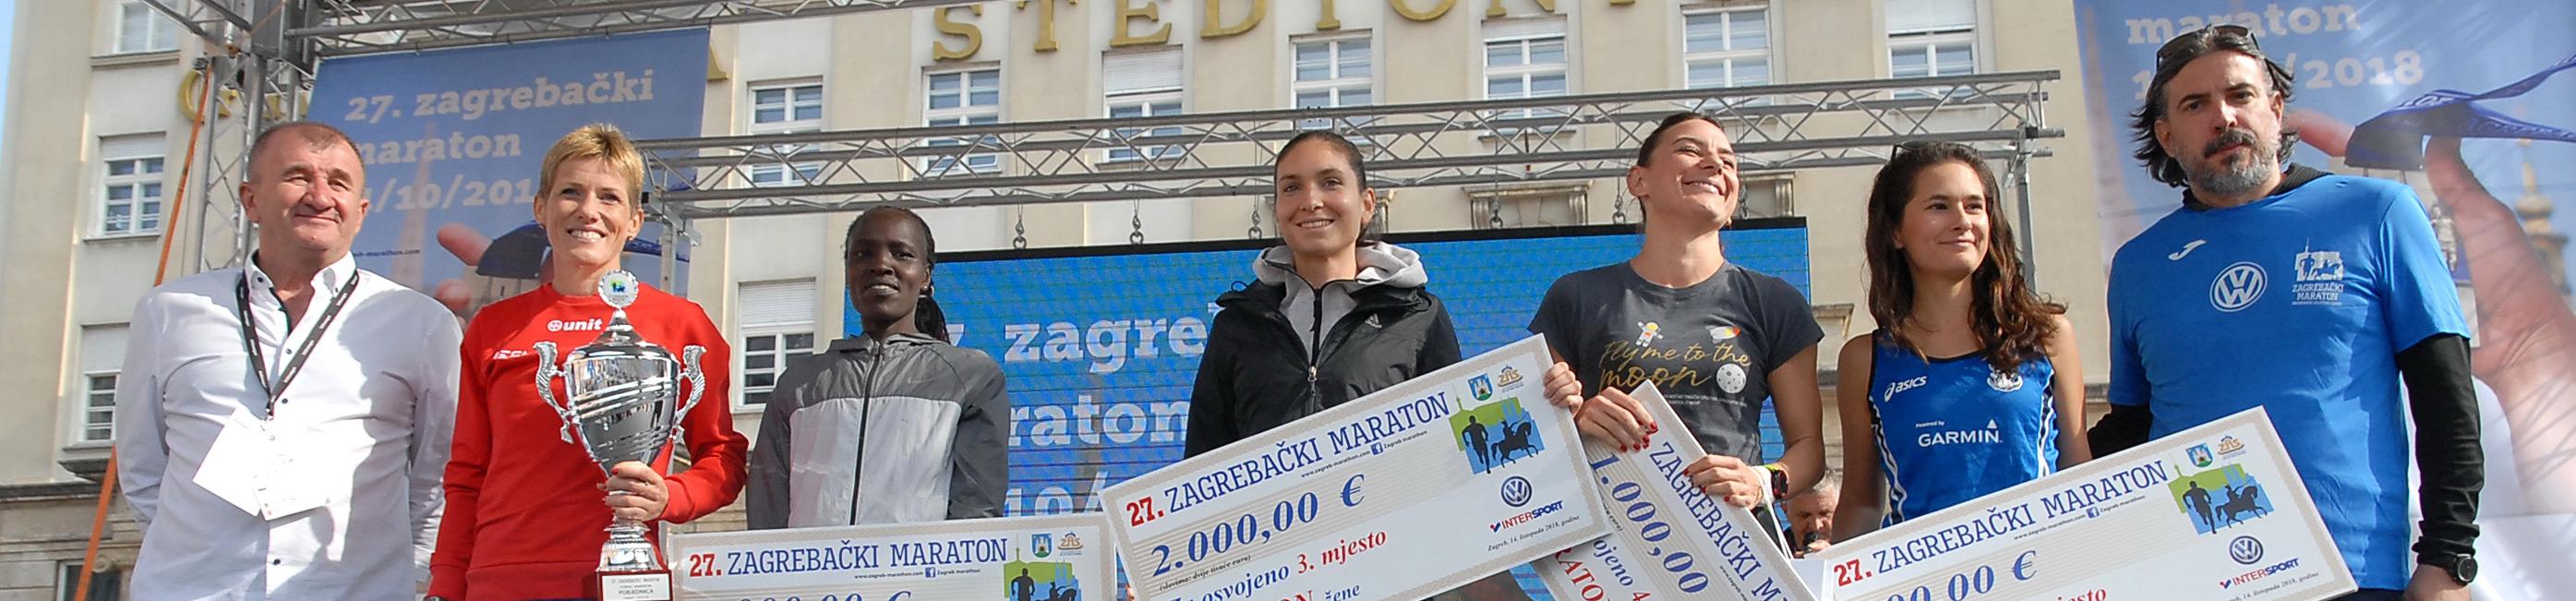 https://www.zagreb-marathon.com/wp-content/uploads/maraton07.jpg